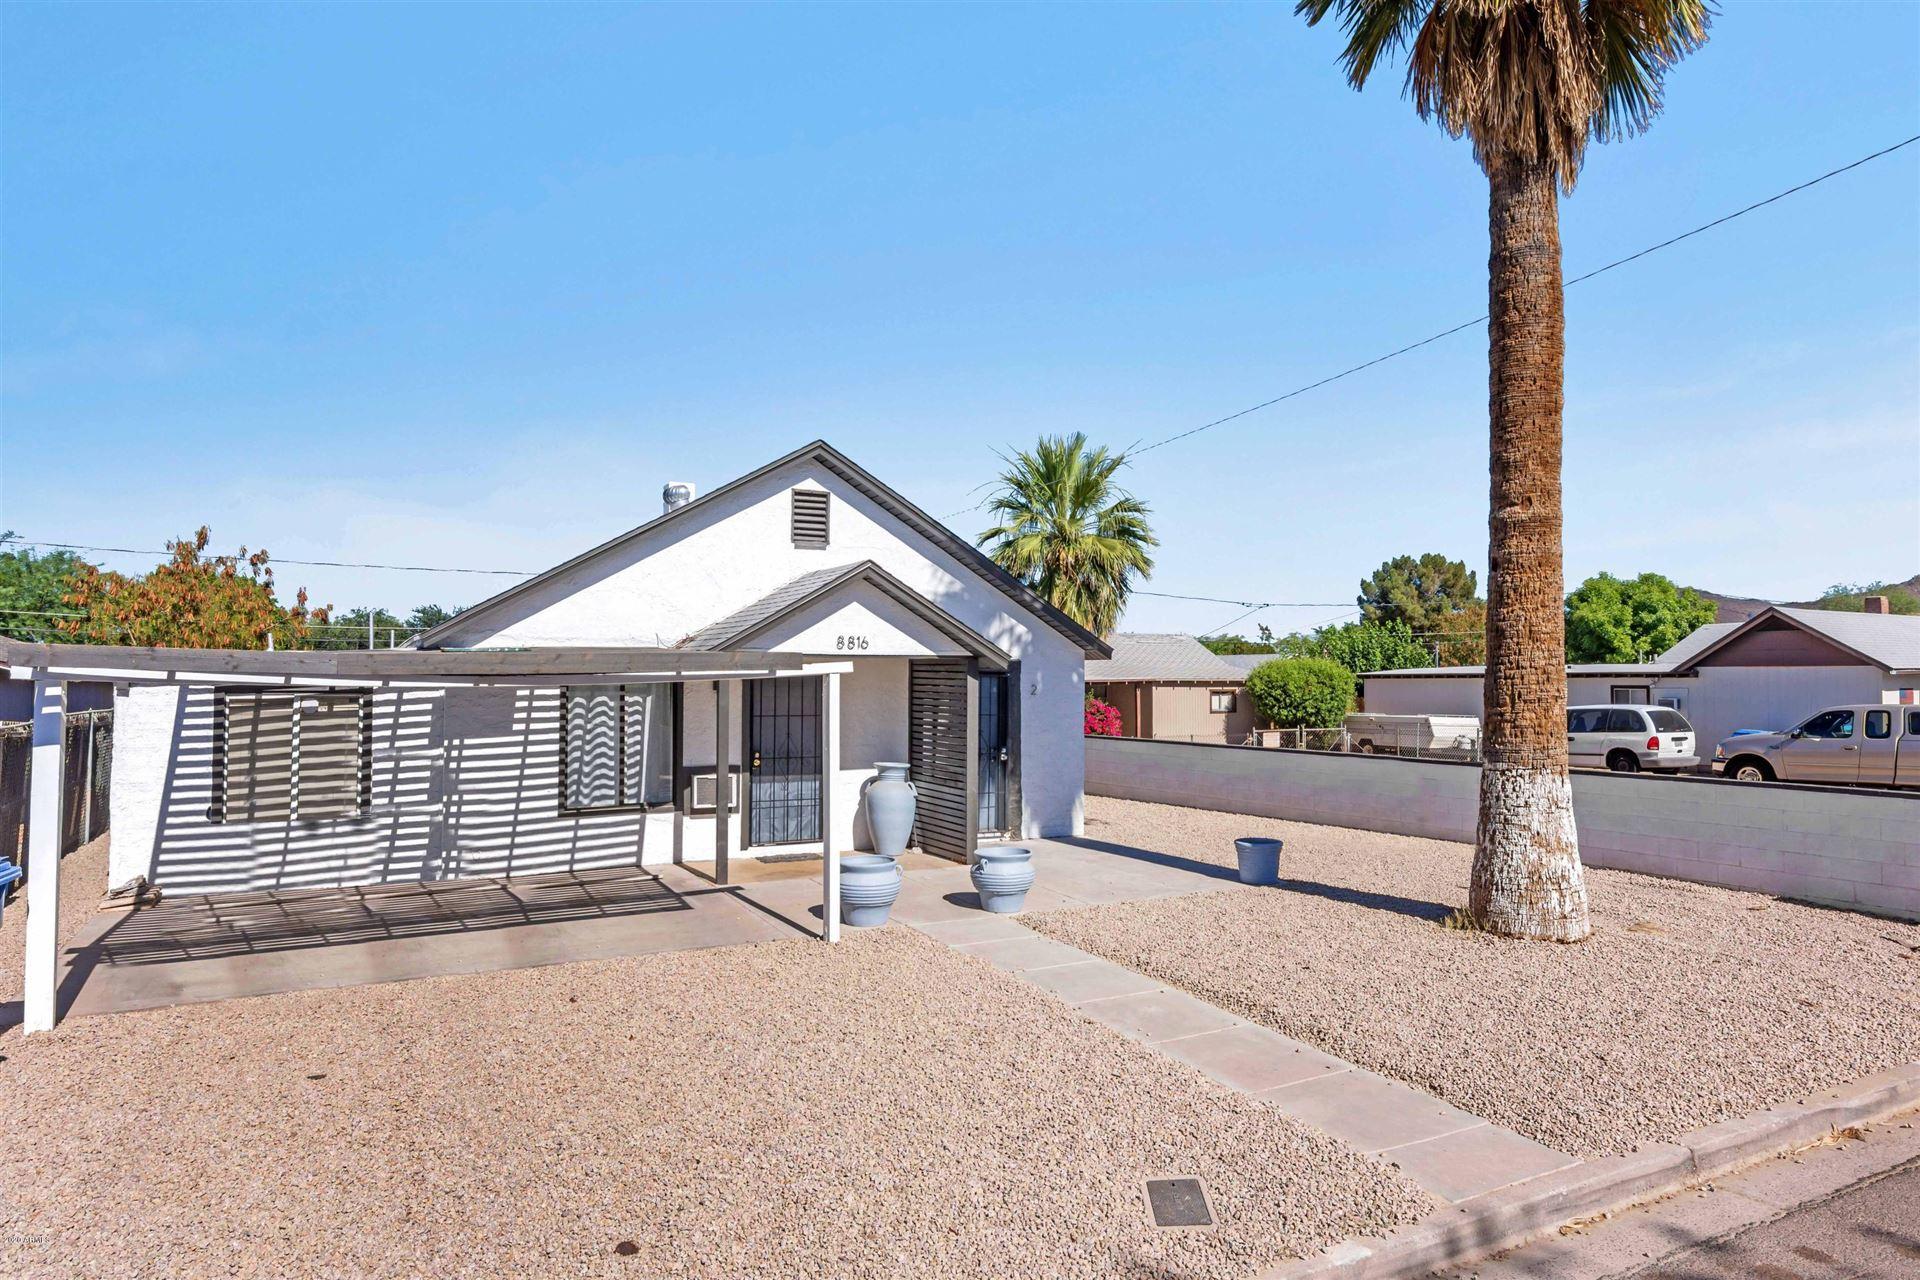 8816 N 6TH Place, Phoenix, AZ 85020 - MLS#: 6144930